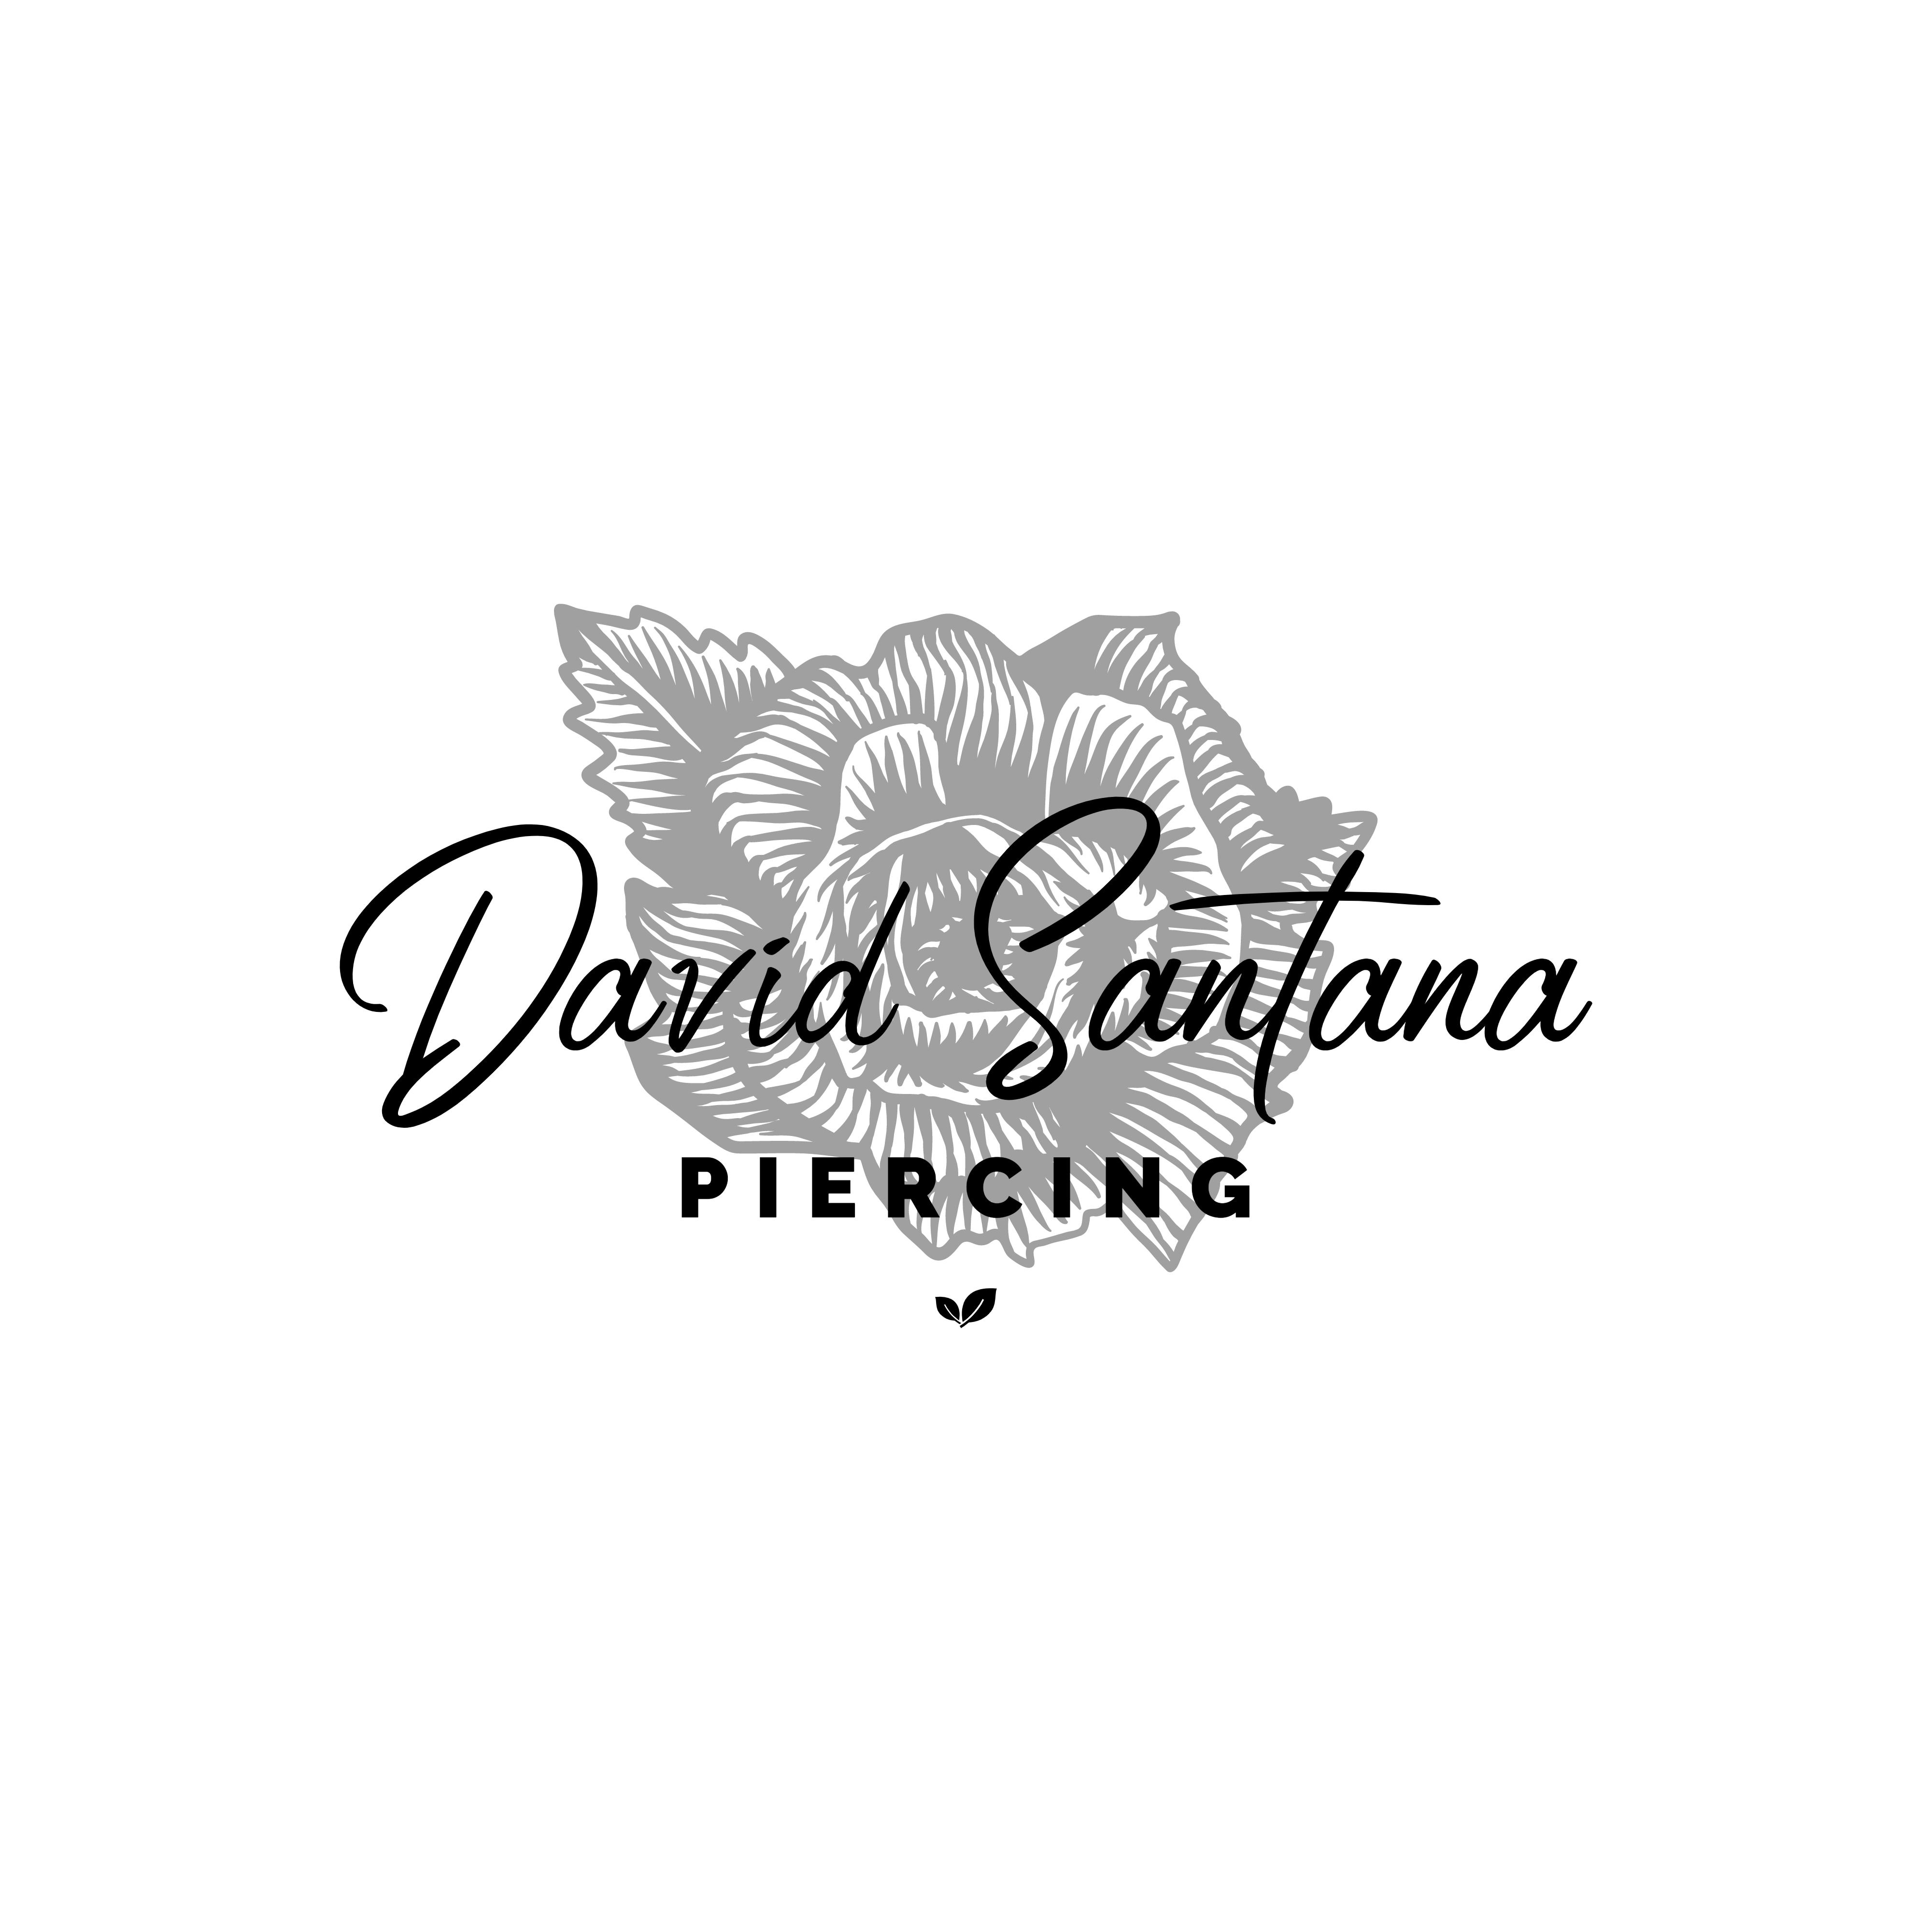 David Santana Piercing